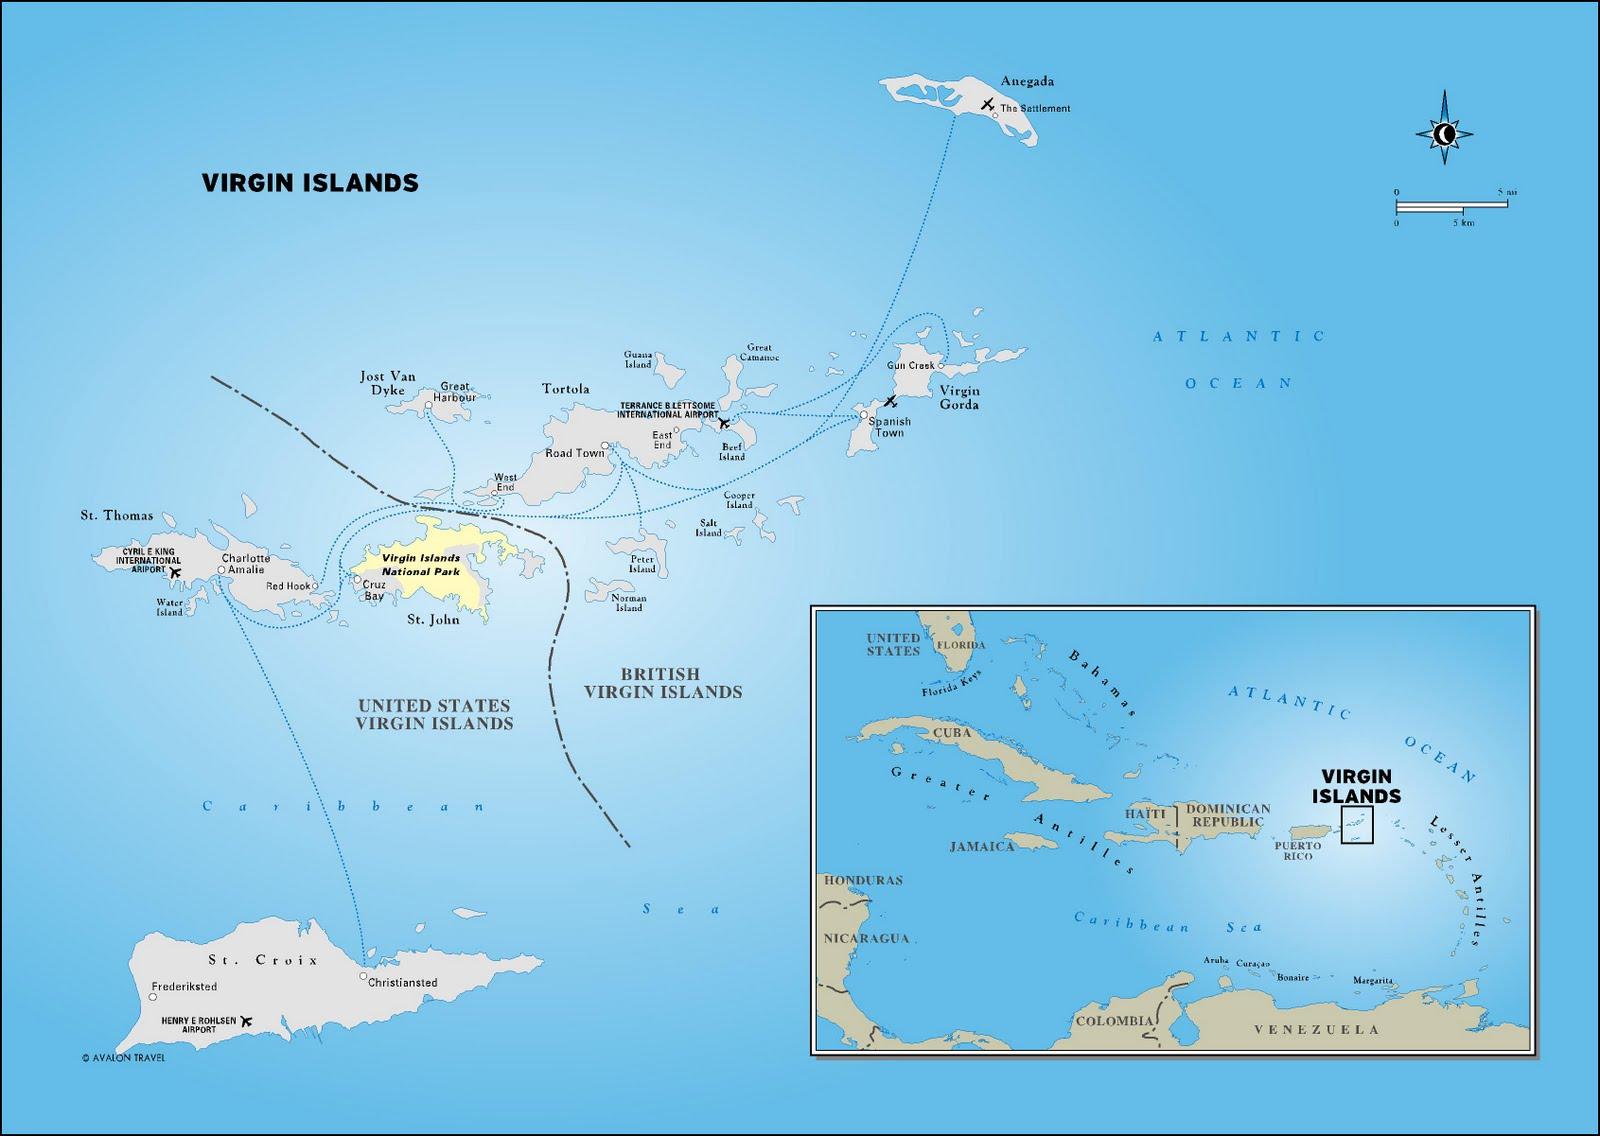 Us Island Map Images U S Islands Maps Perry Casta Eda - British and us virgin islands map